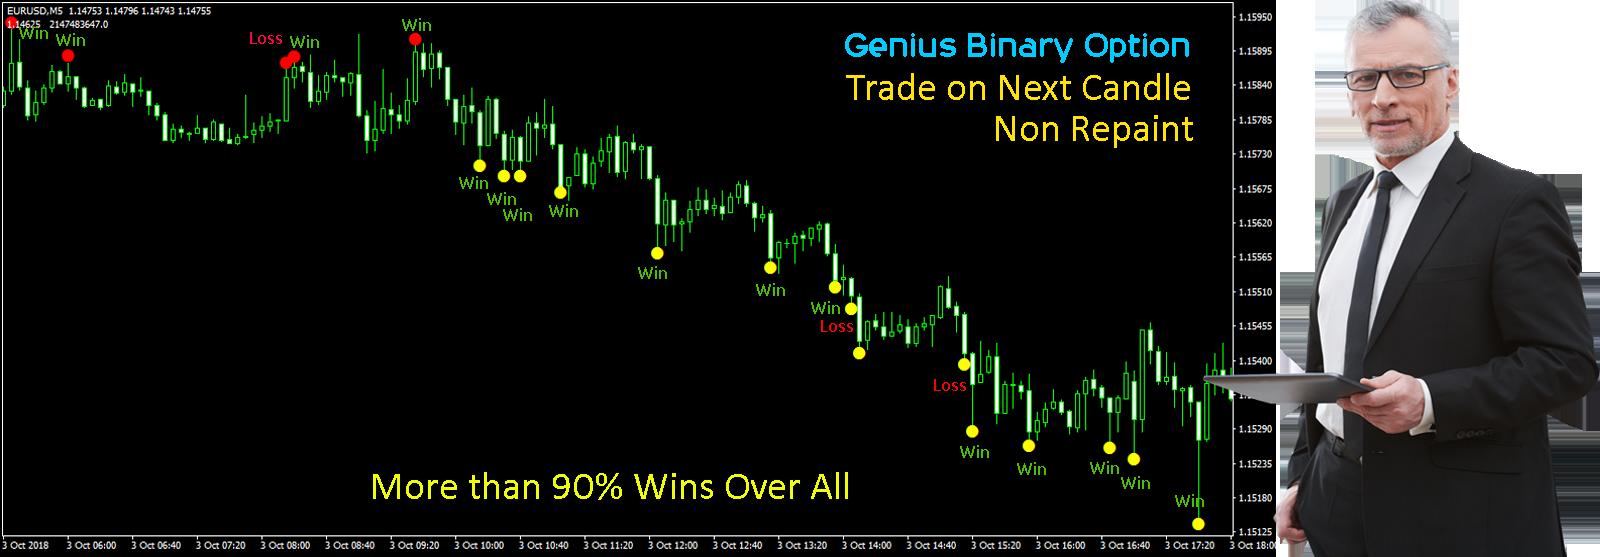 Genius binary options indicator